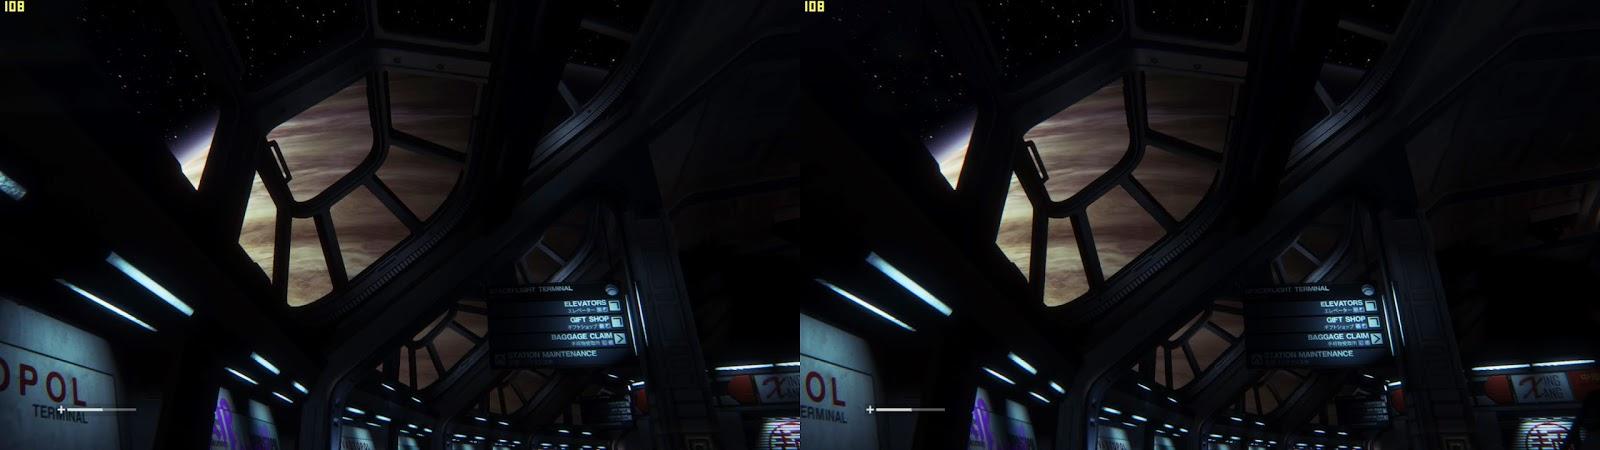 Helix Mod: Alien: Isolation [DX11]